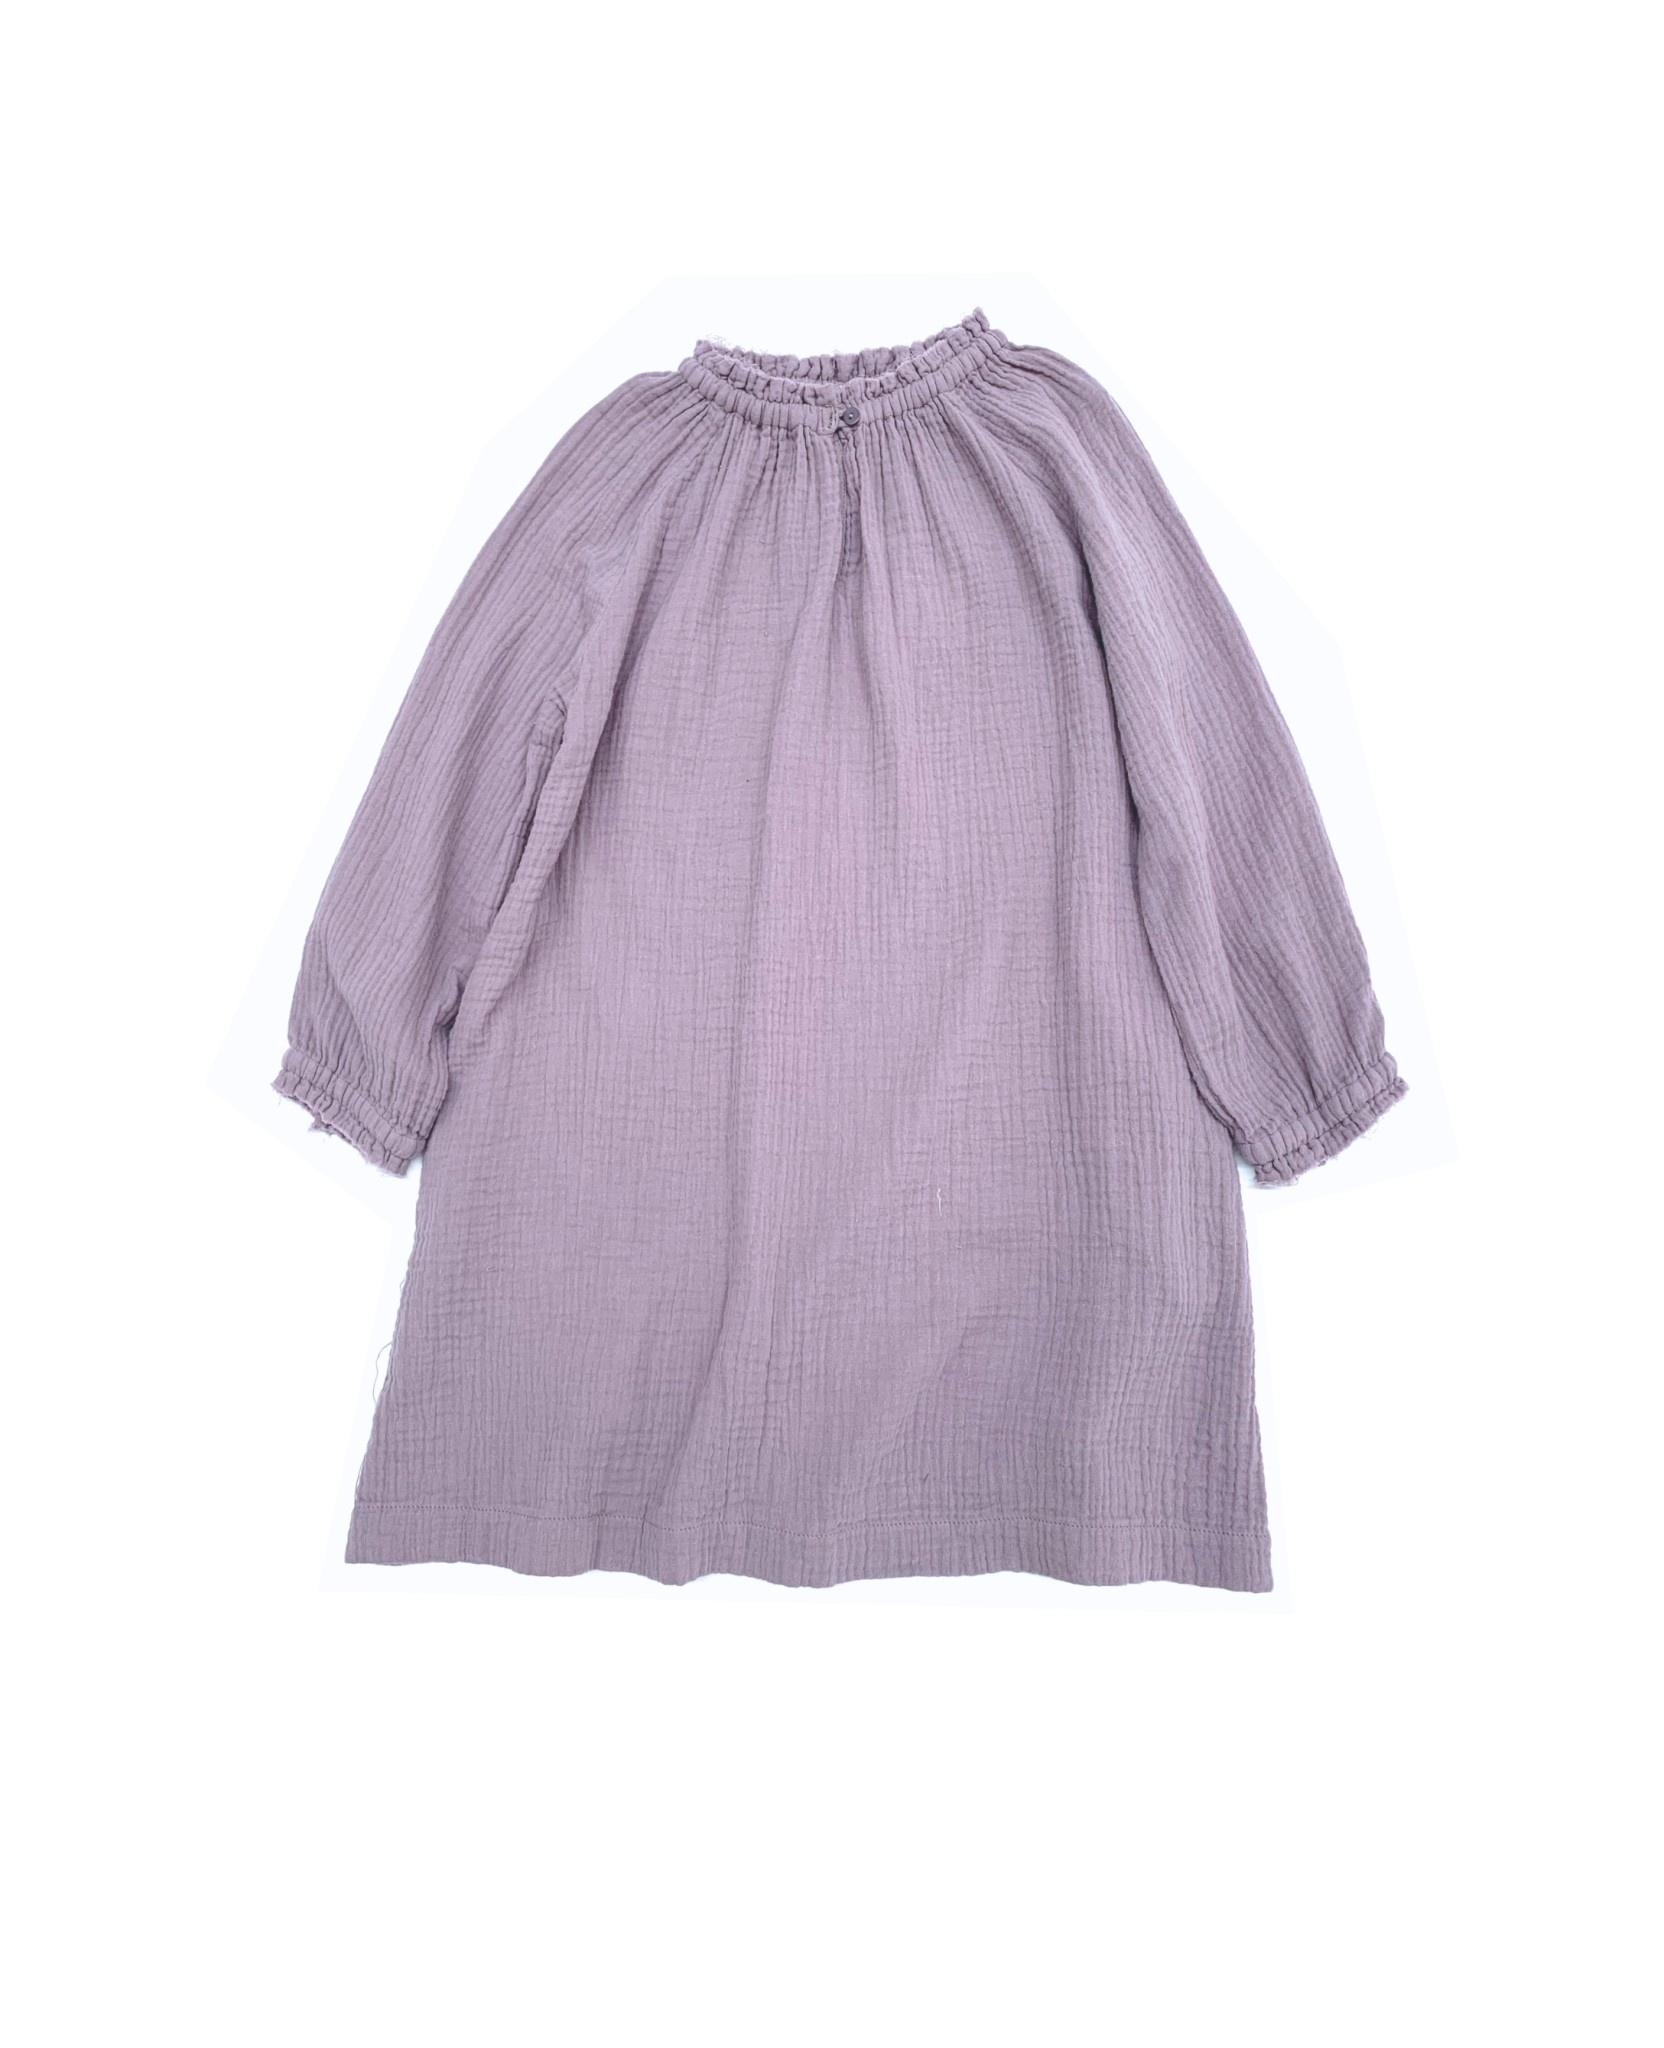 Crinkle baby wide dress lavender-1